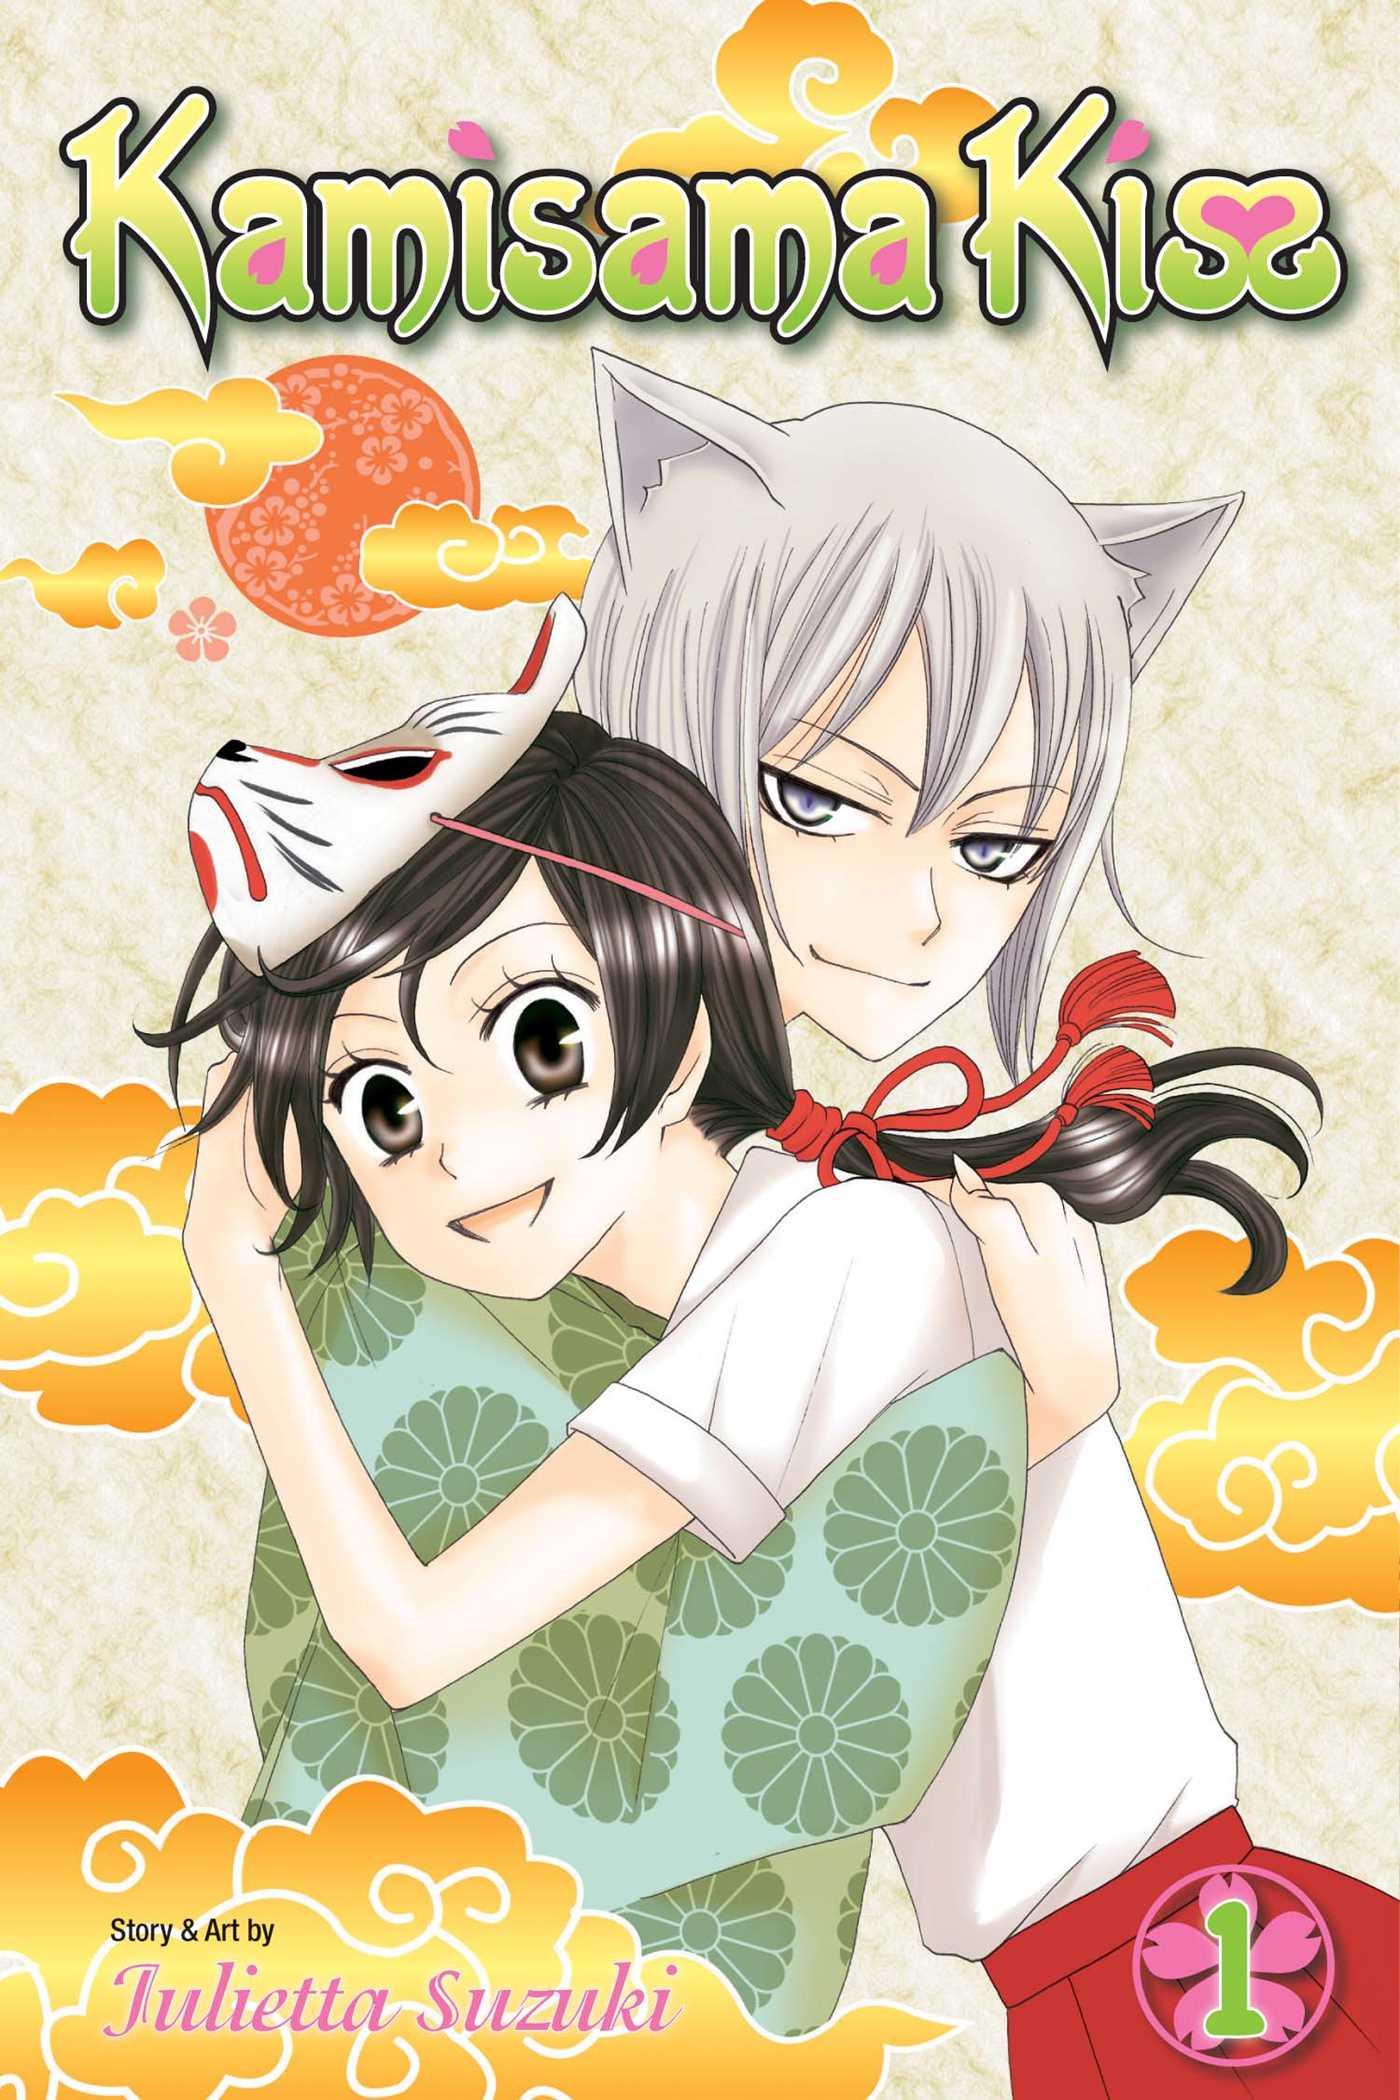 Kamisama Kiss Vol 1 Book By Julietta Suzuki Official Publisher